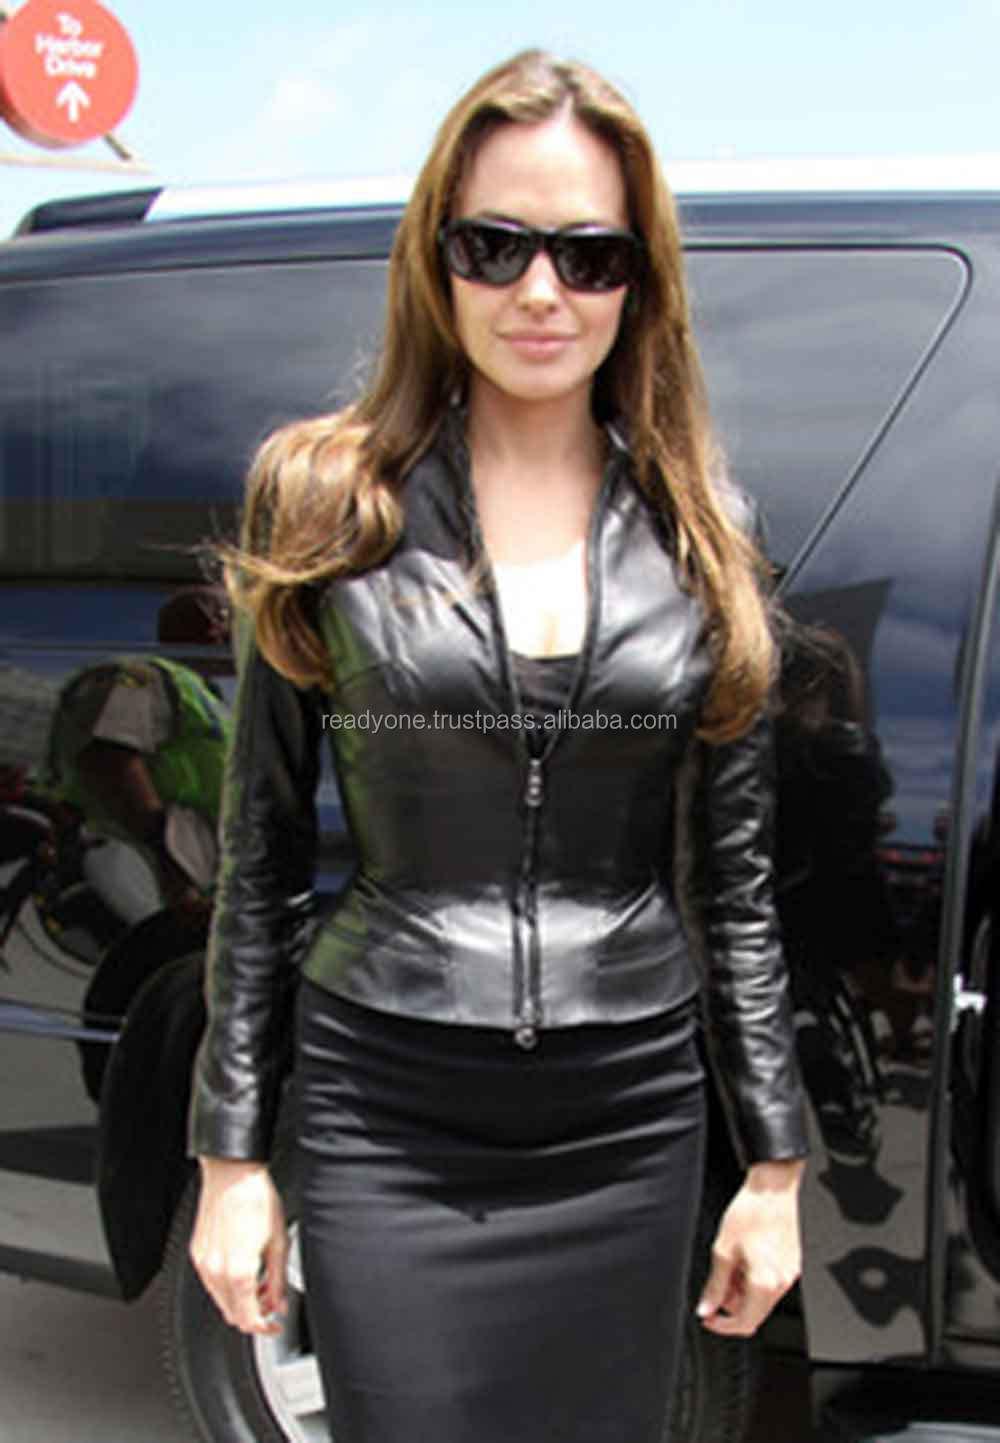 d9be0fdddae Anglena Jolie Fashionable Black Leather Jackets - Buy Black Faux Pu ...